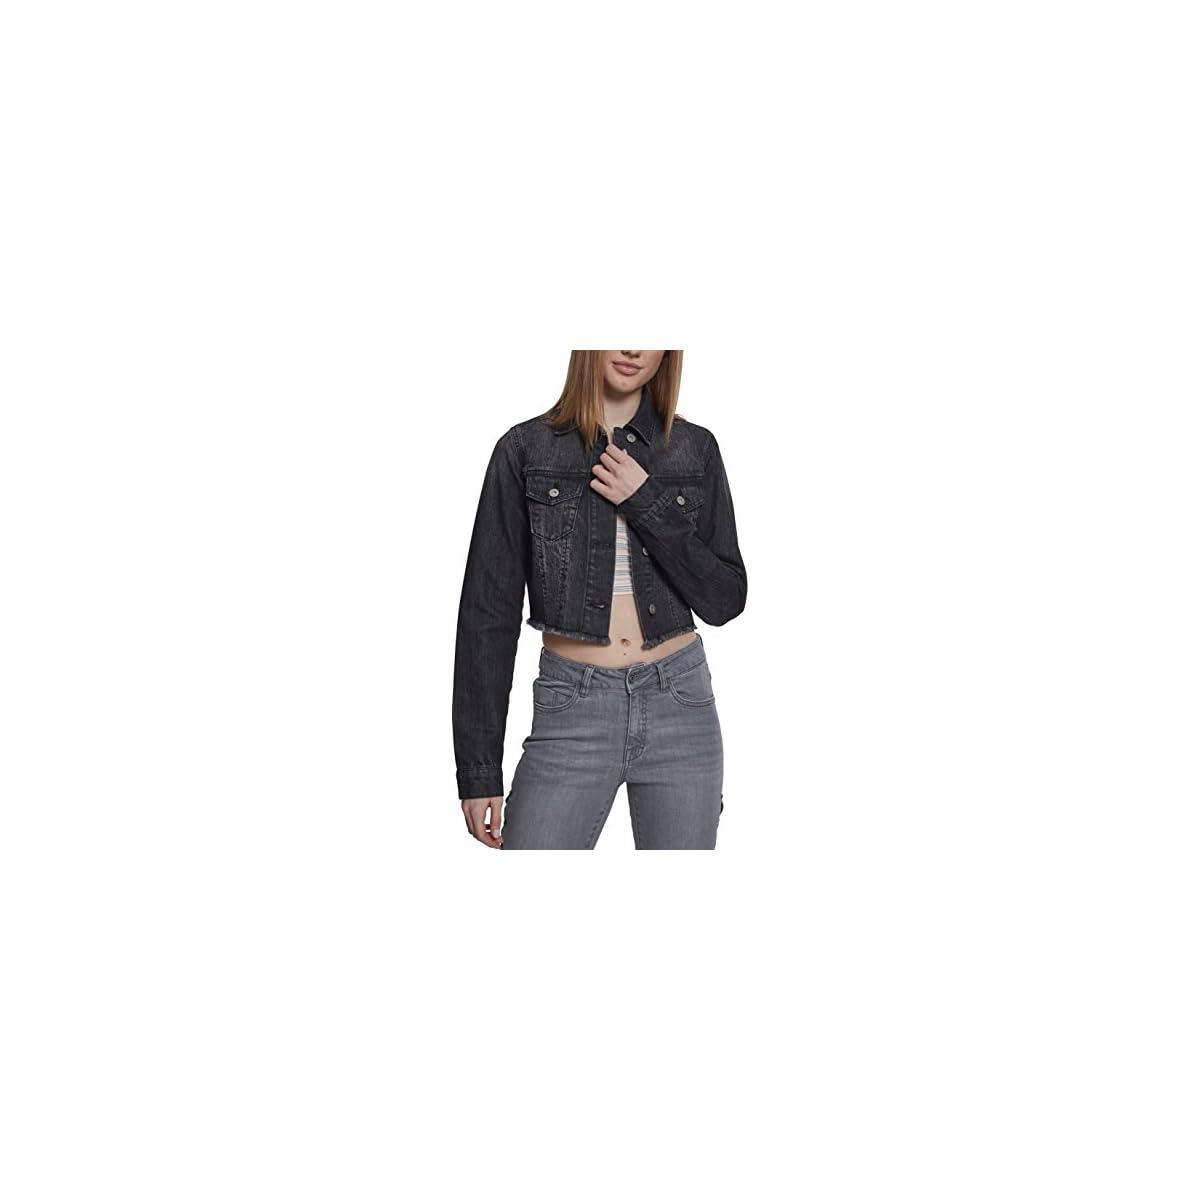 Urban Classics Damen Ladies Short Denim Jacket Jeansjacke Schwarz X-Small